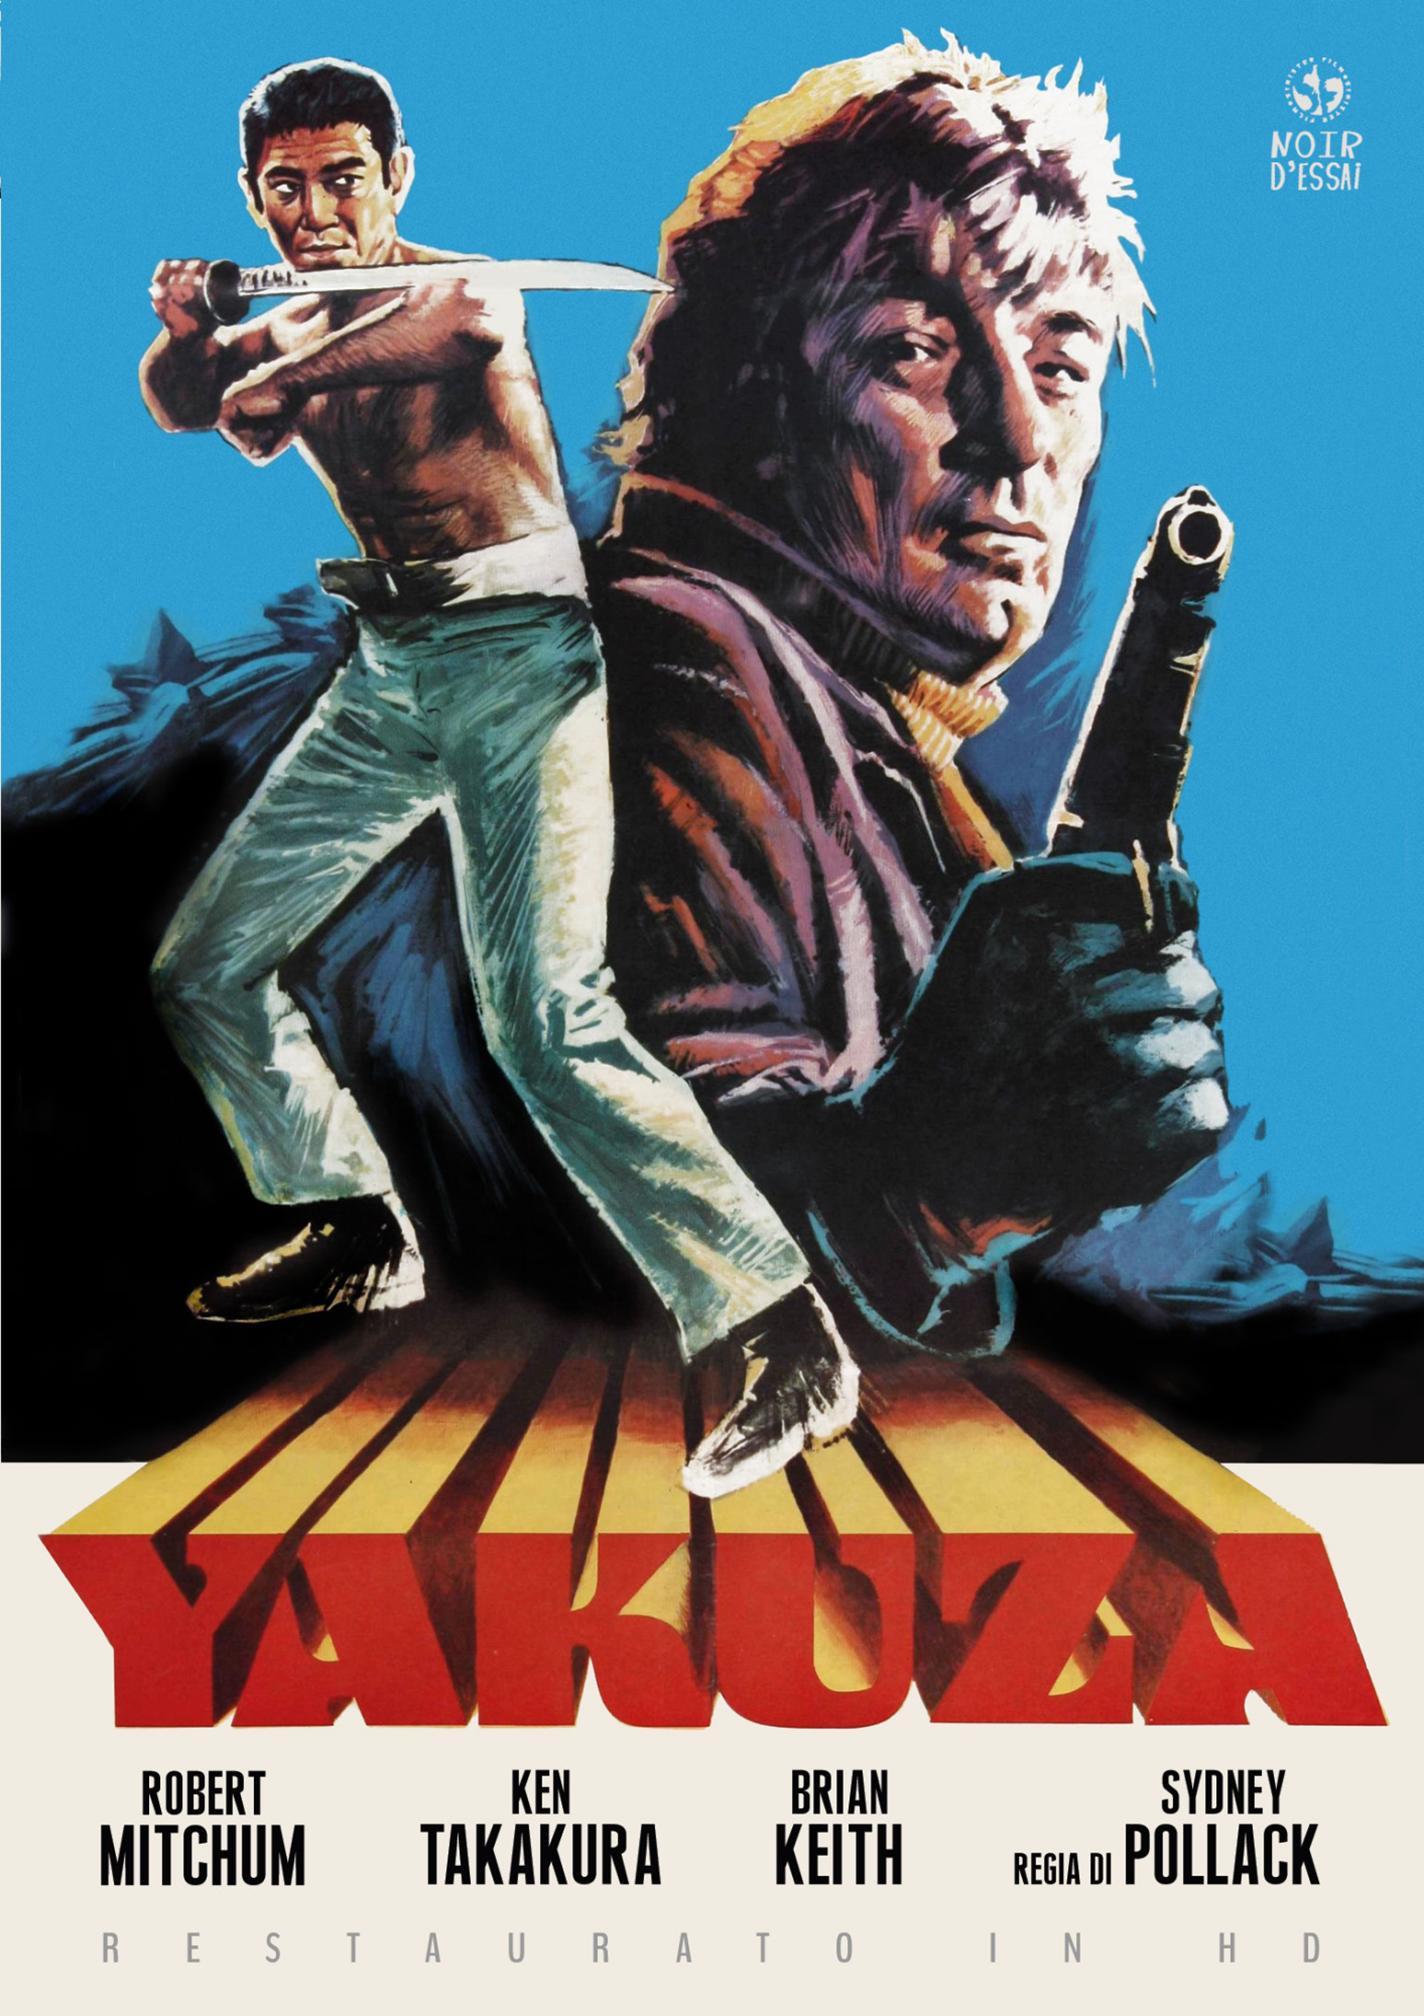 YAKUZA (RESTAURATO IN HD) (DVD)